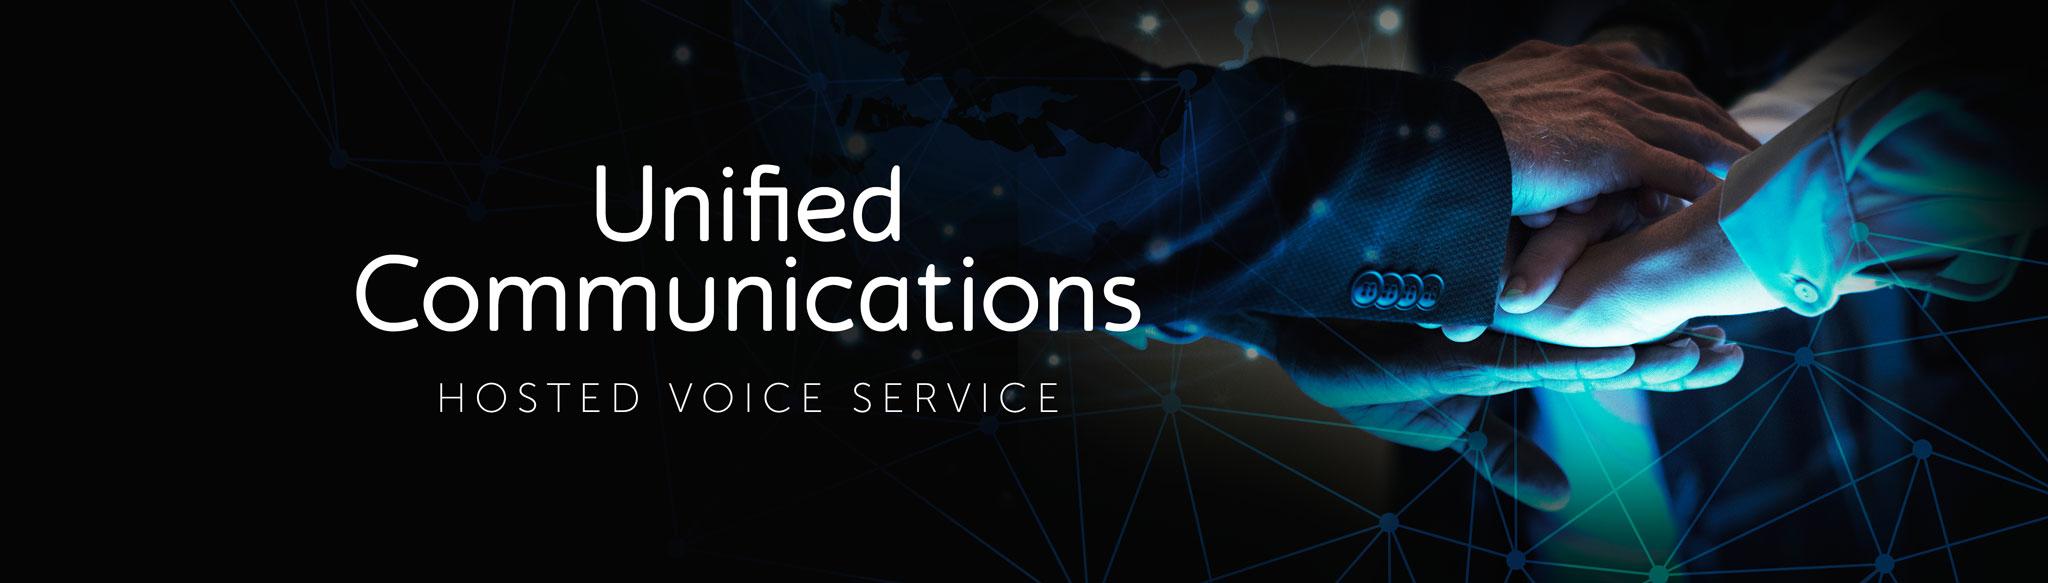 Unified Communicatioins